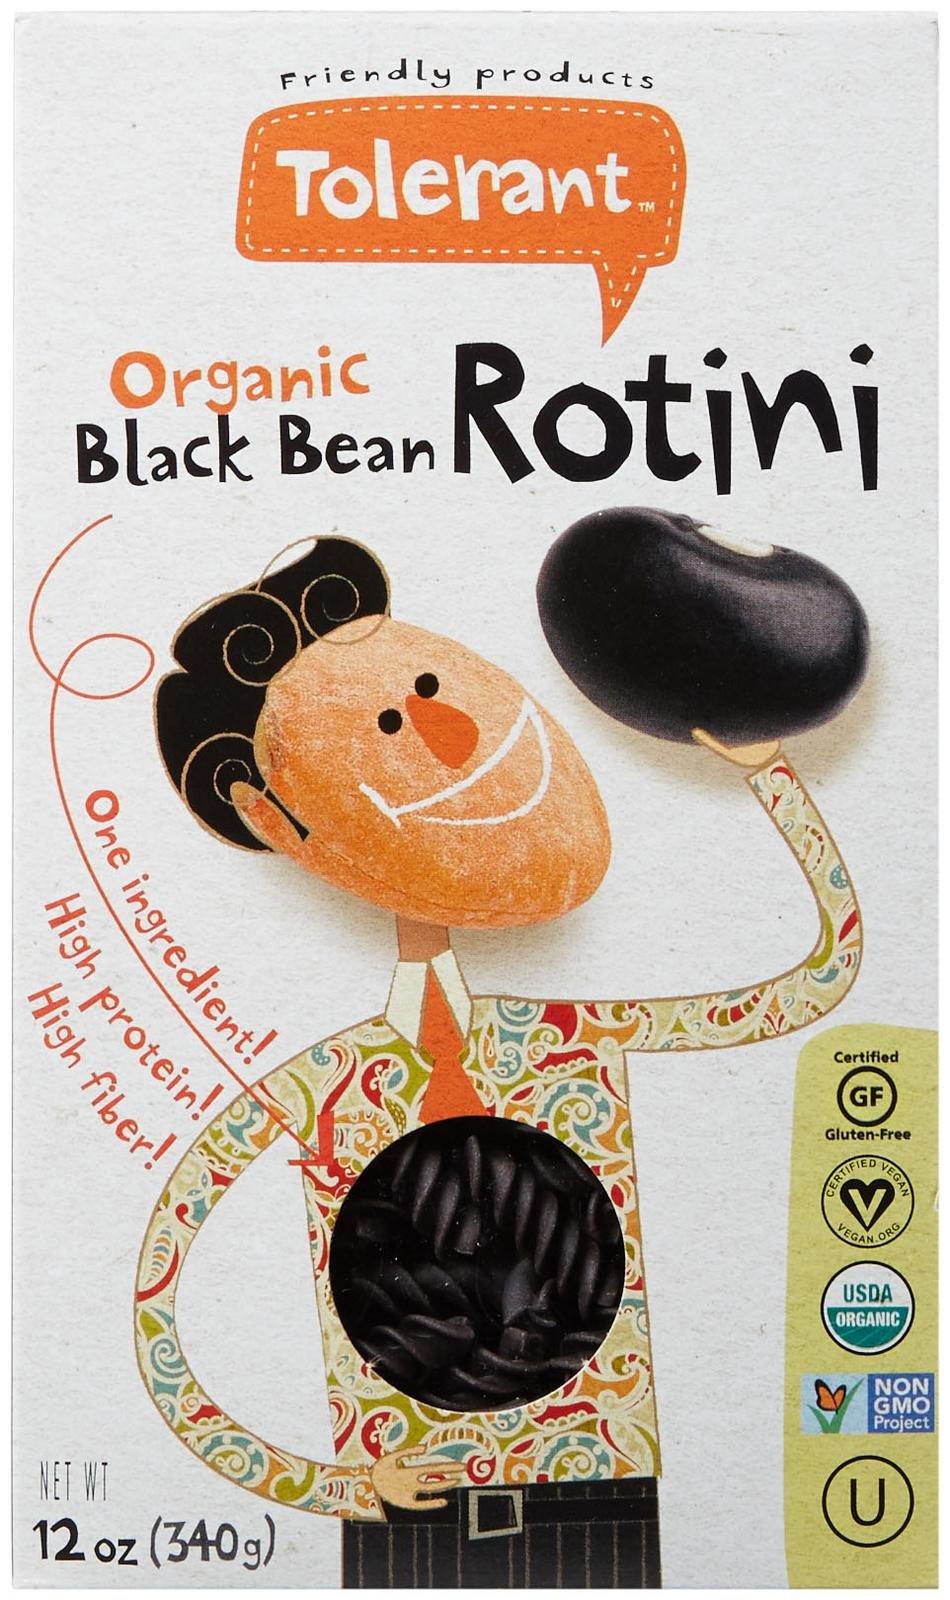 Tolerant Food Organic Black Bean Rotini - 12 oz - Vegan